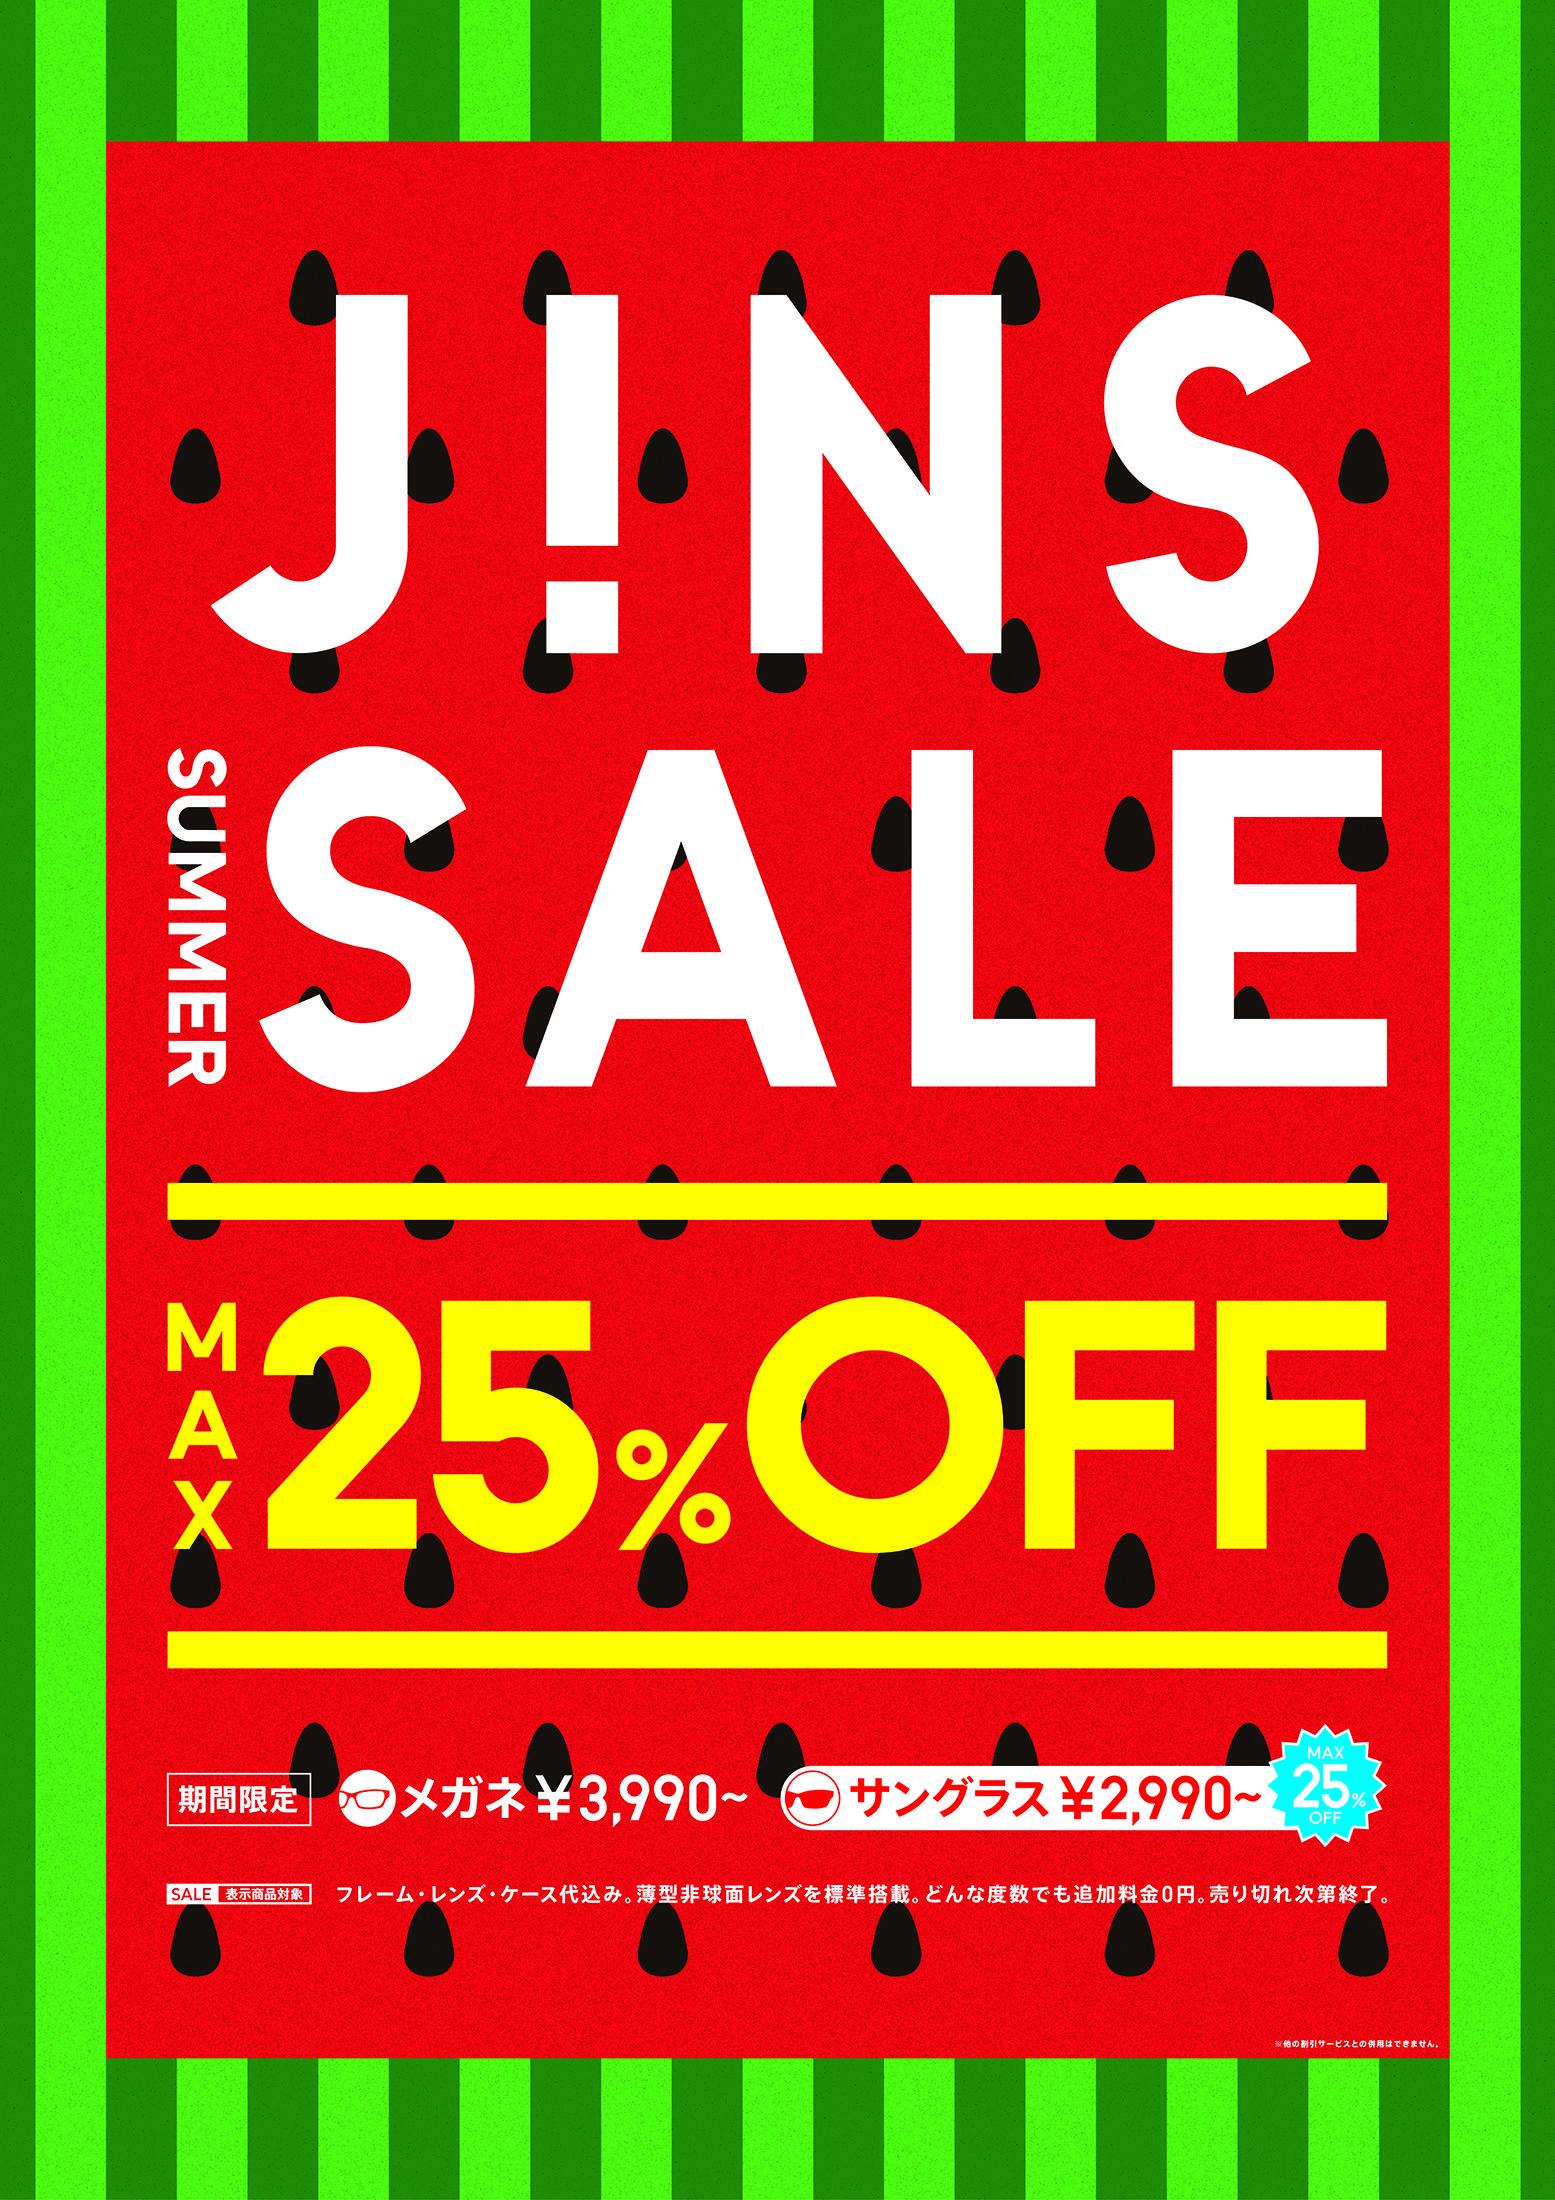 Jins - Art Direction: Takayoshi Sato; Design: Osawa Yudai, Yasuhiro Ueda